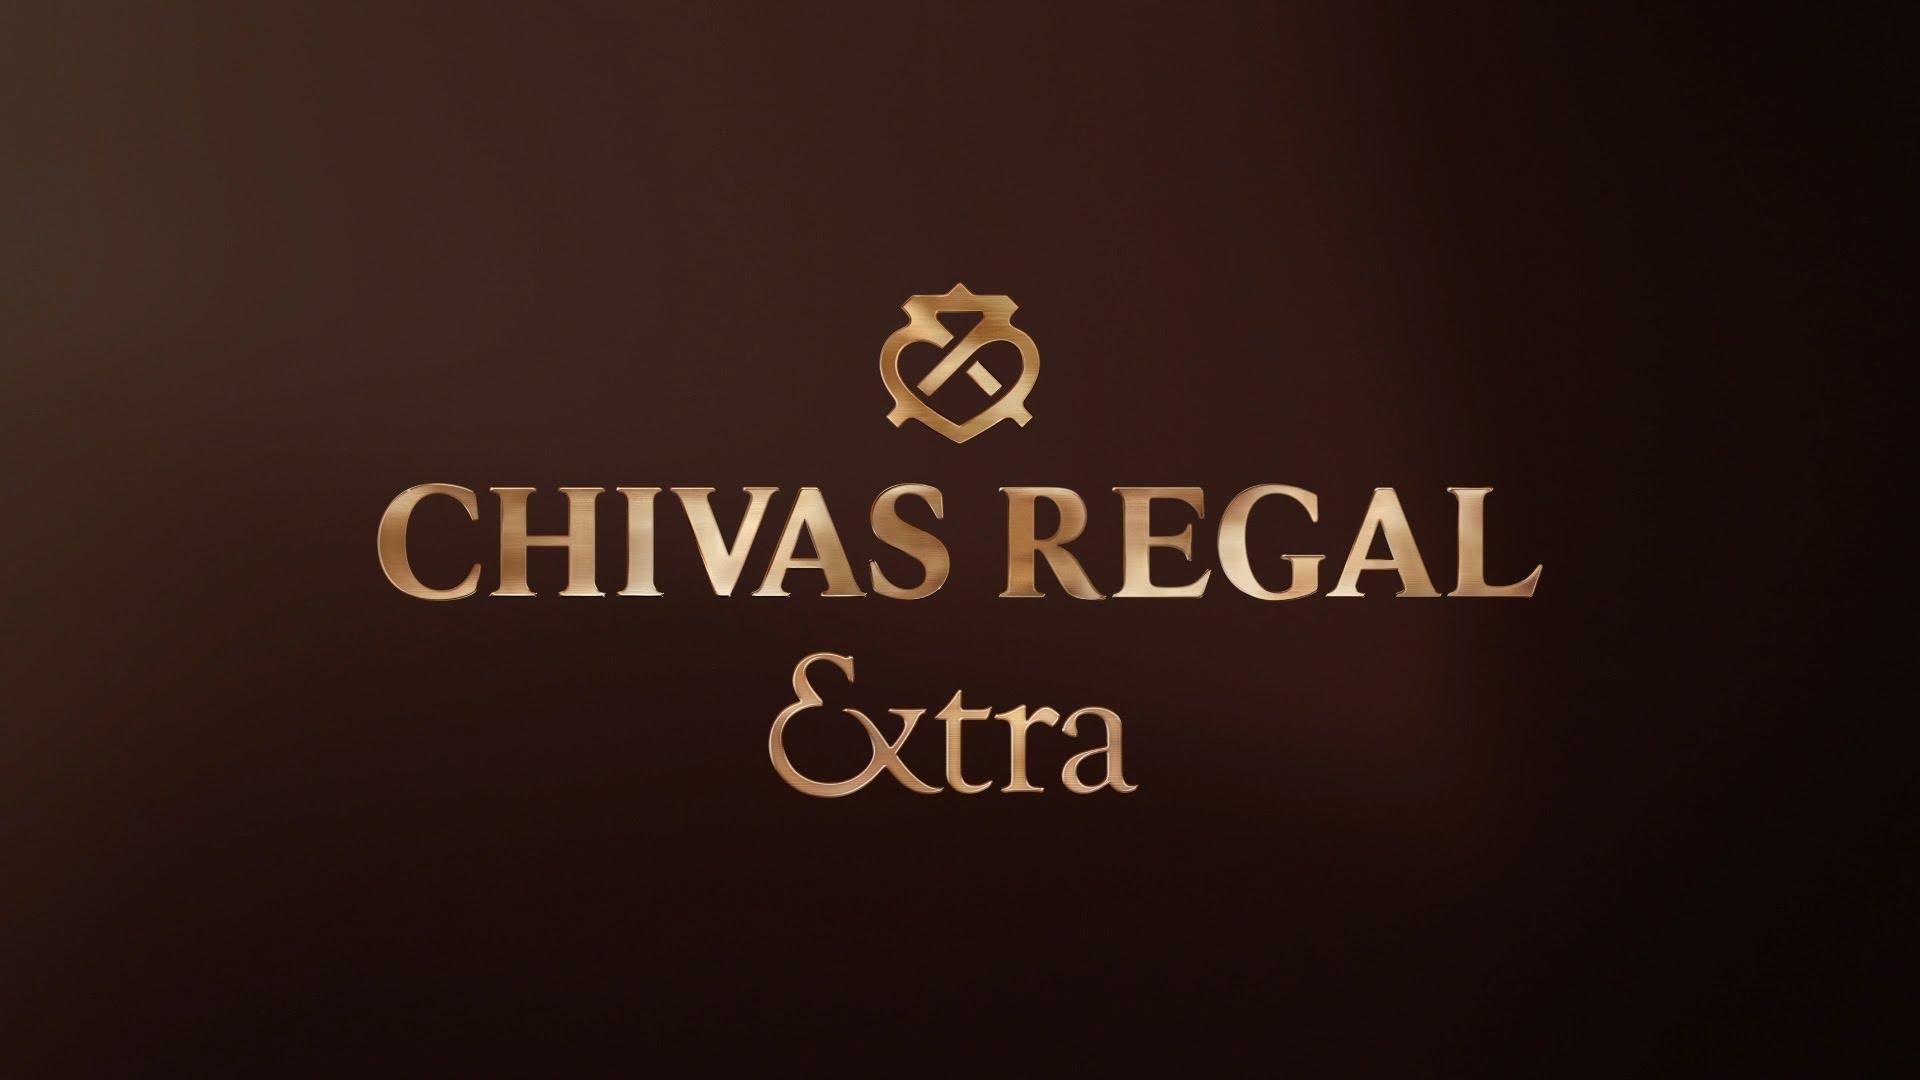 Chivas regal extra povyšuje prémiovou whisky na novou úroveň